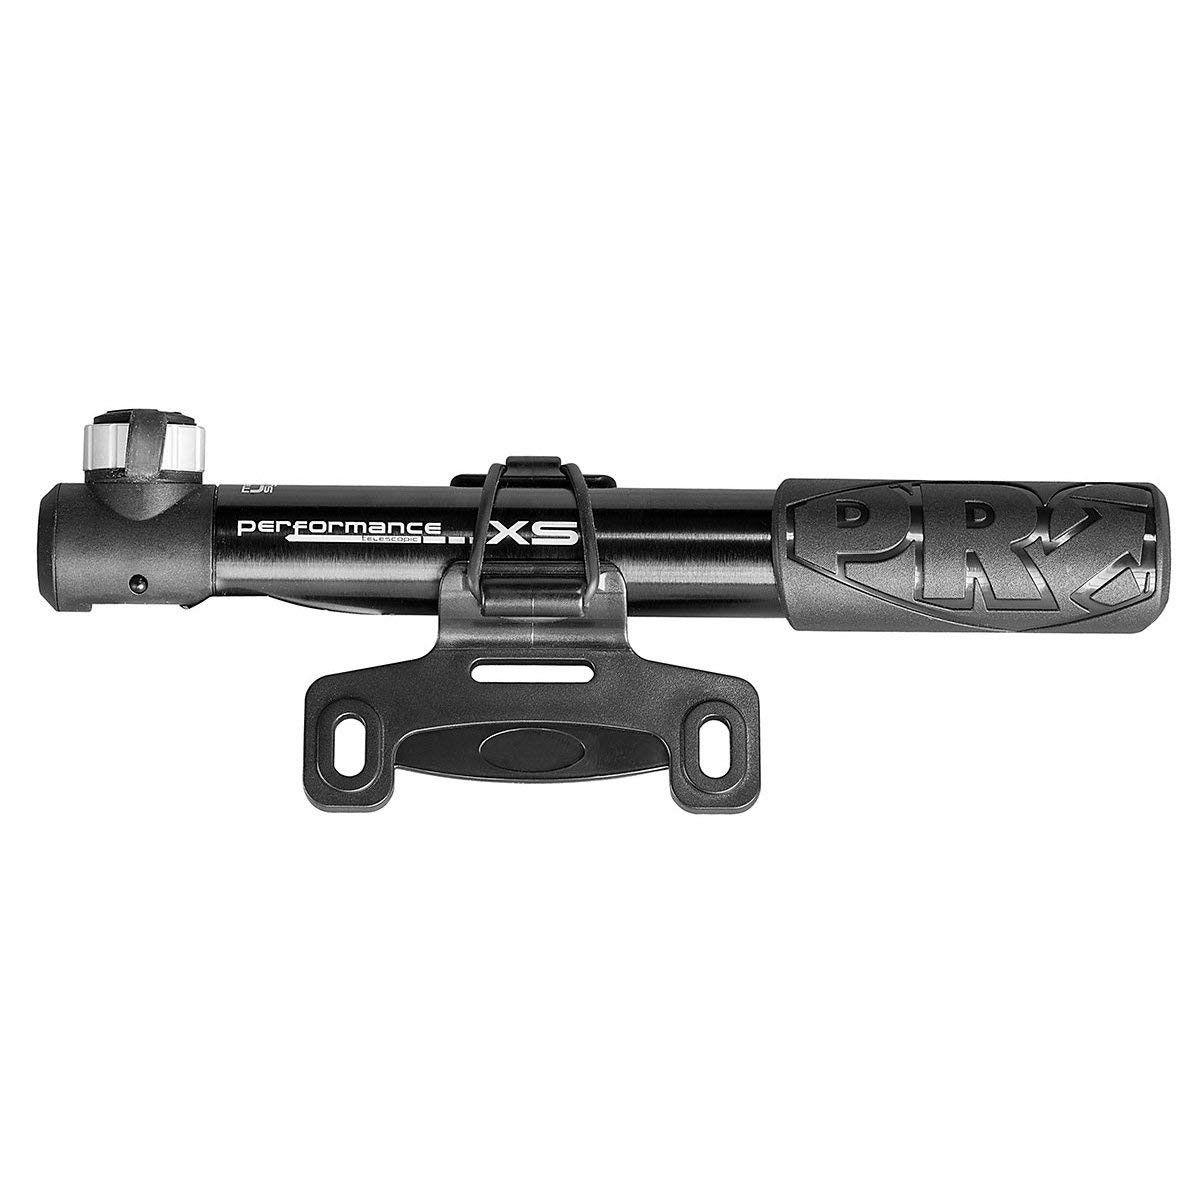 Mini Bomba de Ar Shimano Pro Perfomance Telescopic XS 120psi